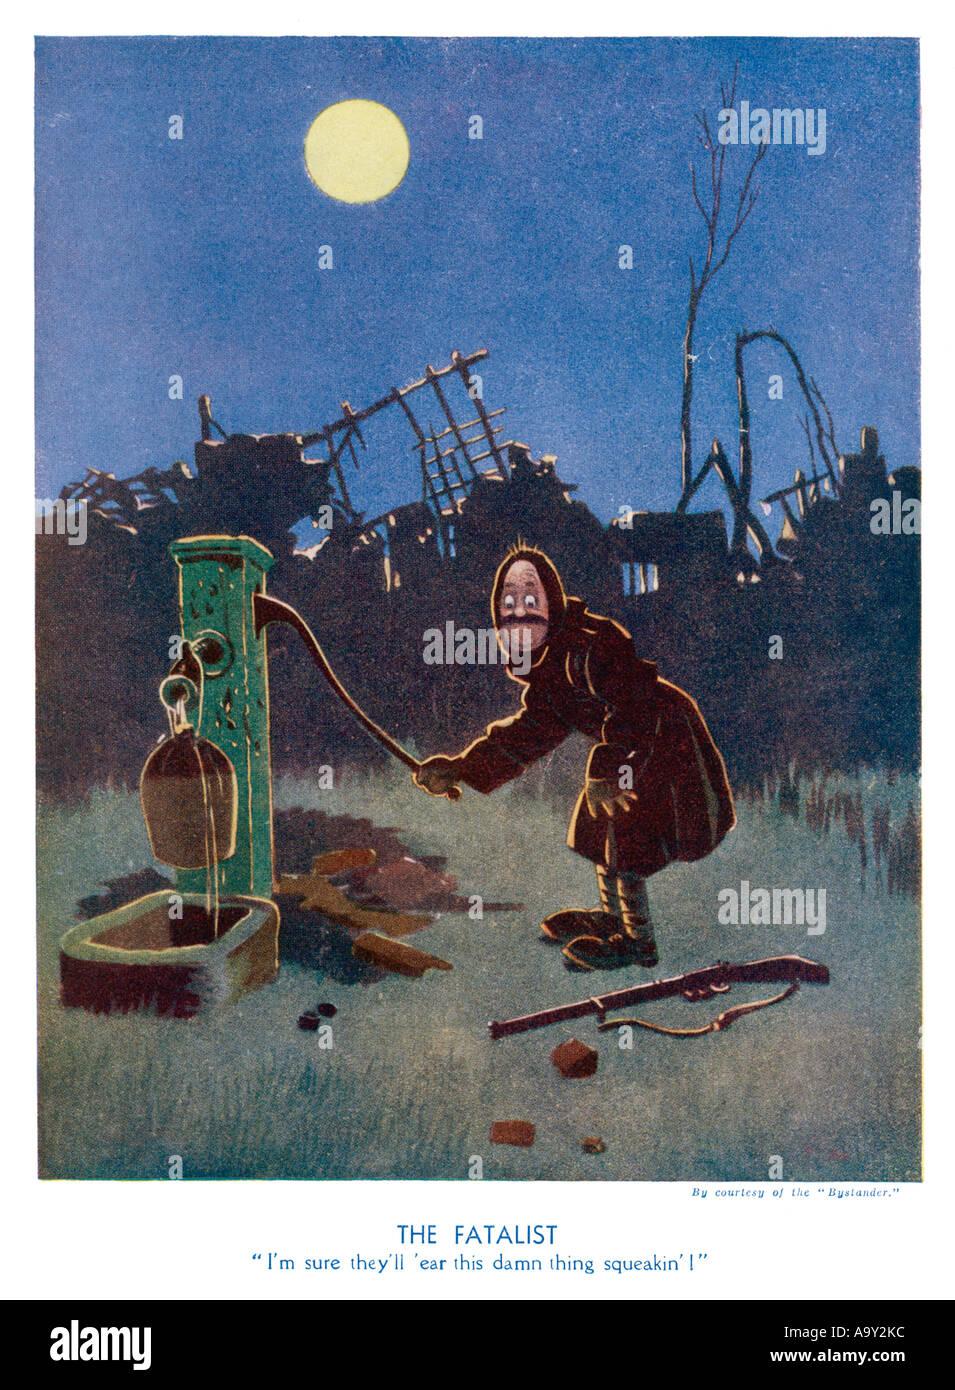 Ww1 Cartoon Squeaky Pump - Stock Image